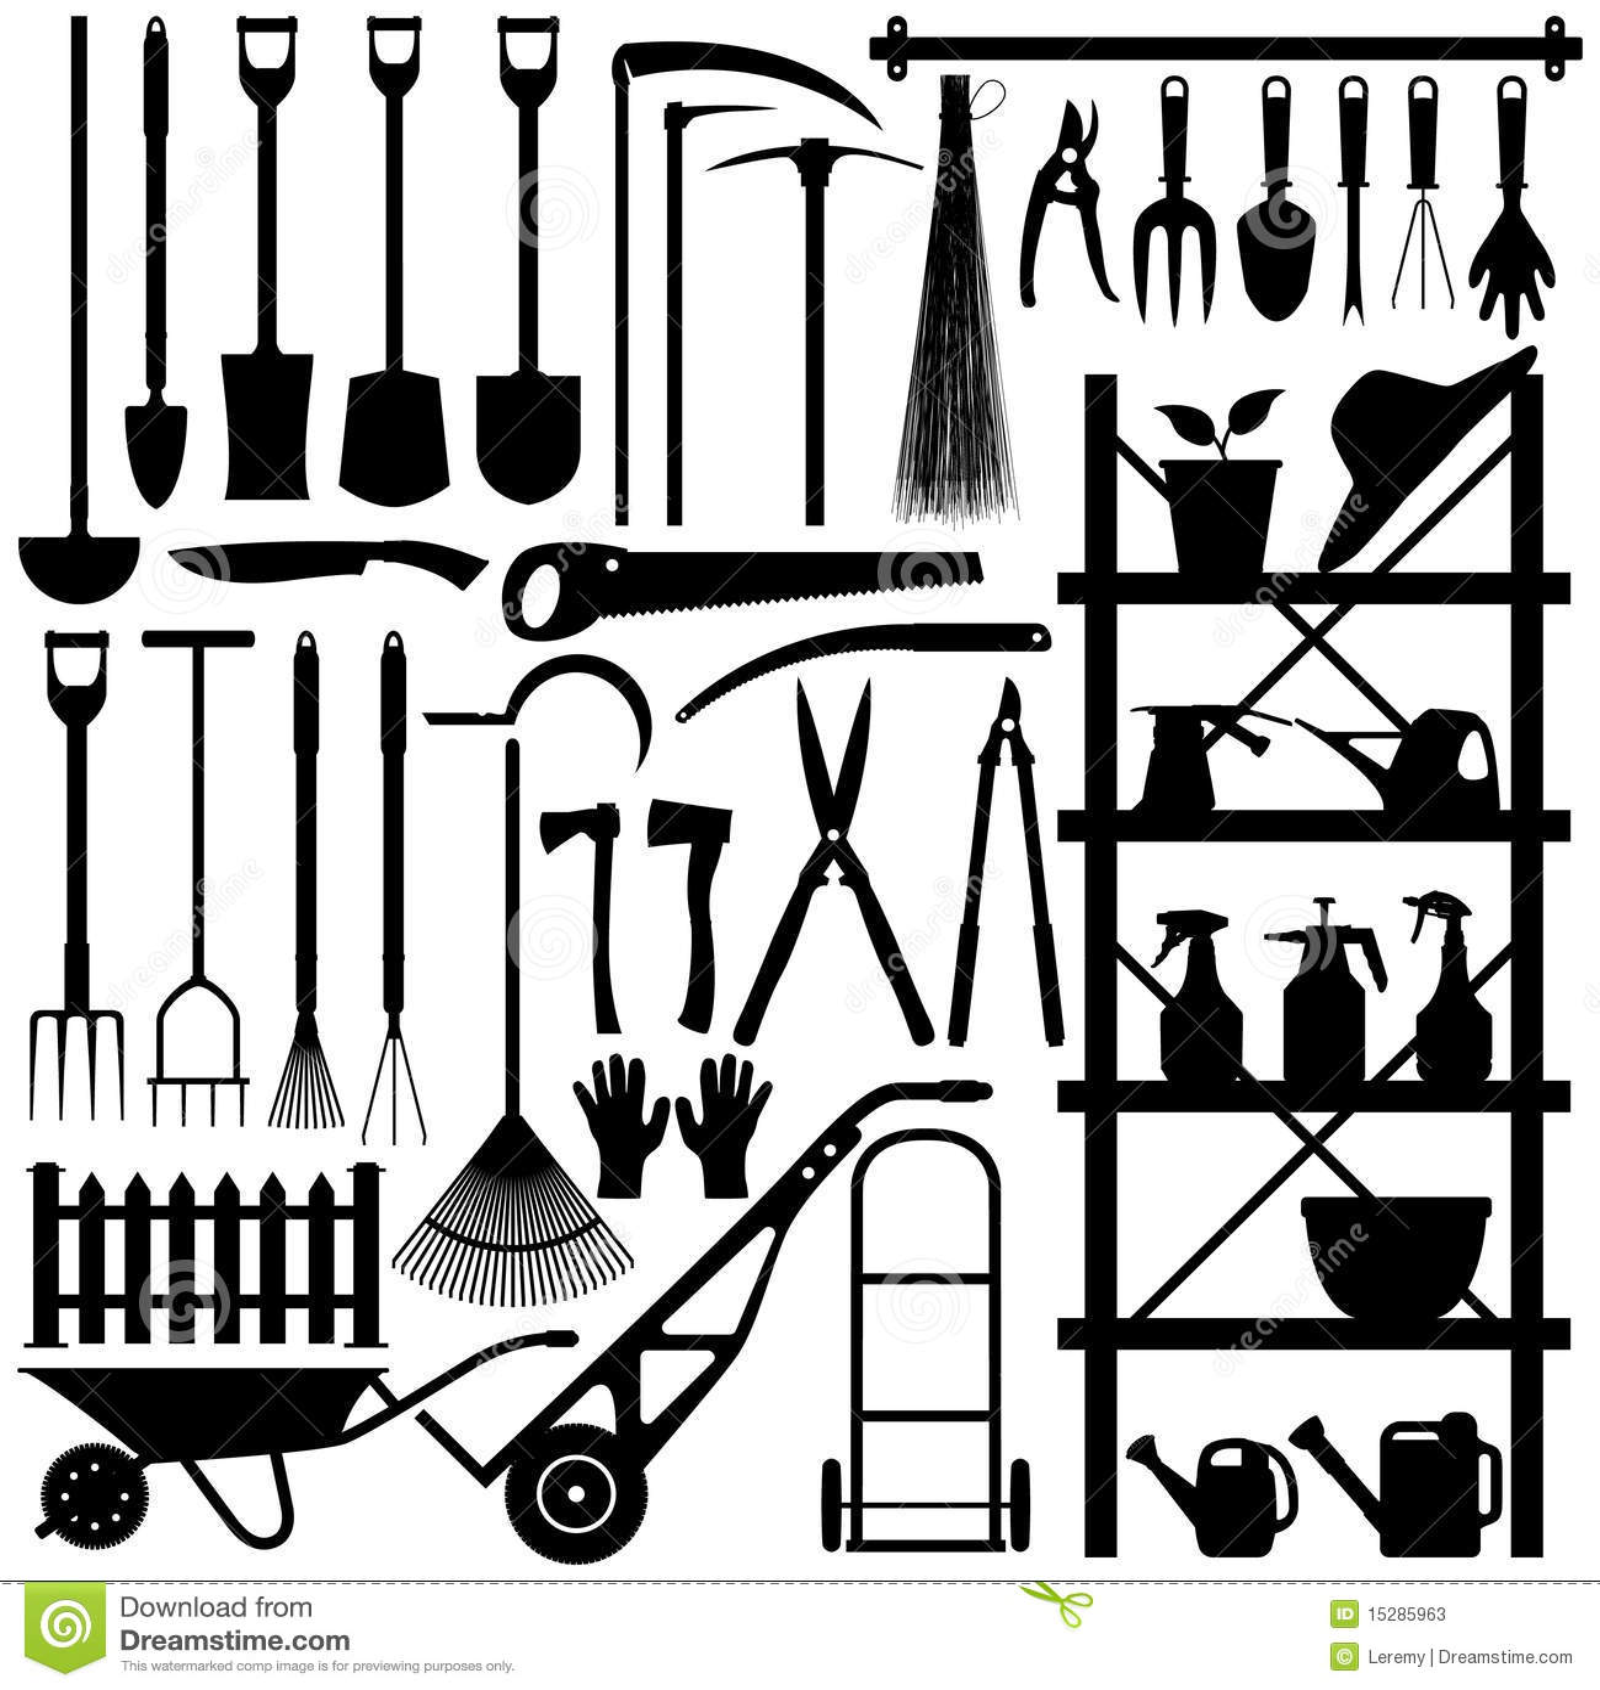 Gardening Tools Silhouette Stock Vector Illustration Of